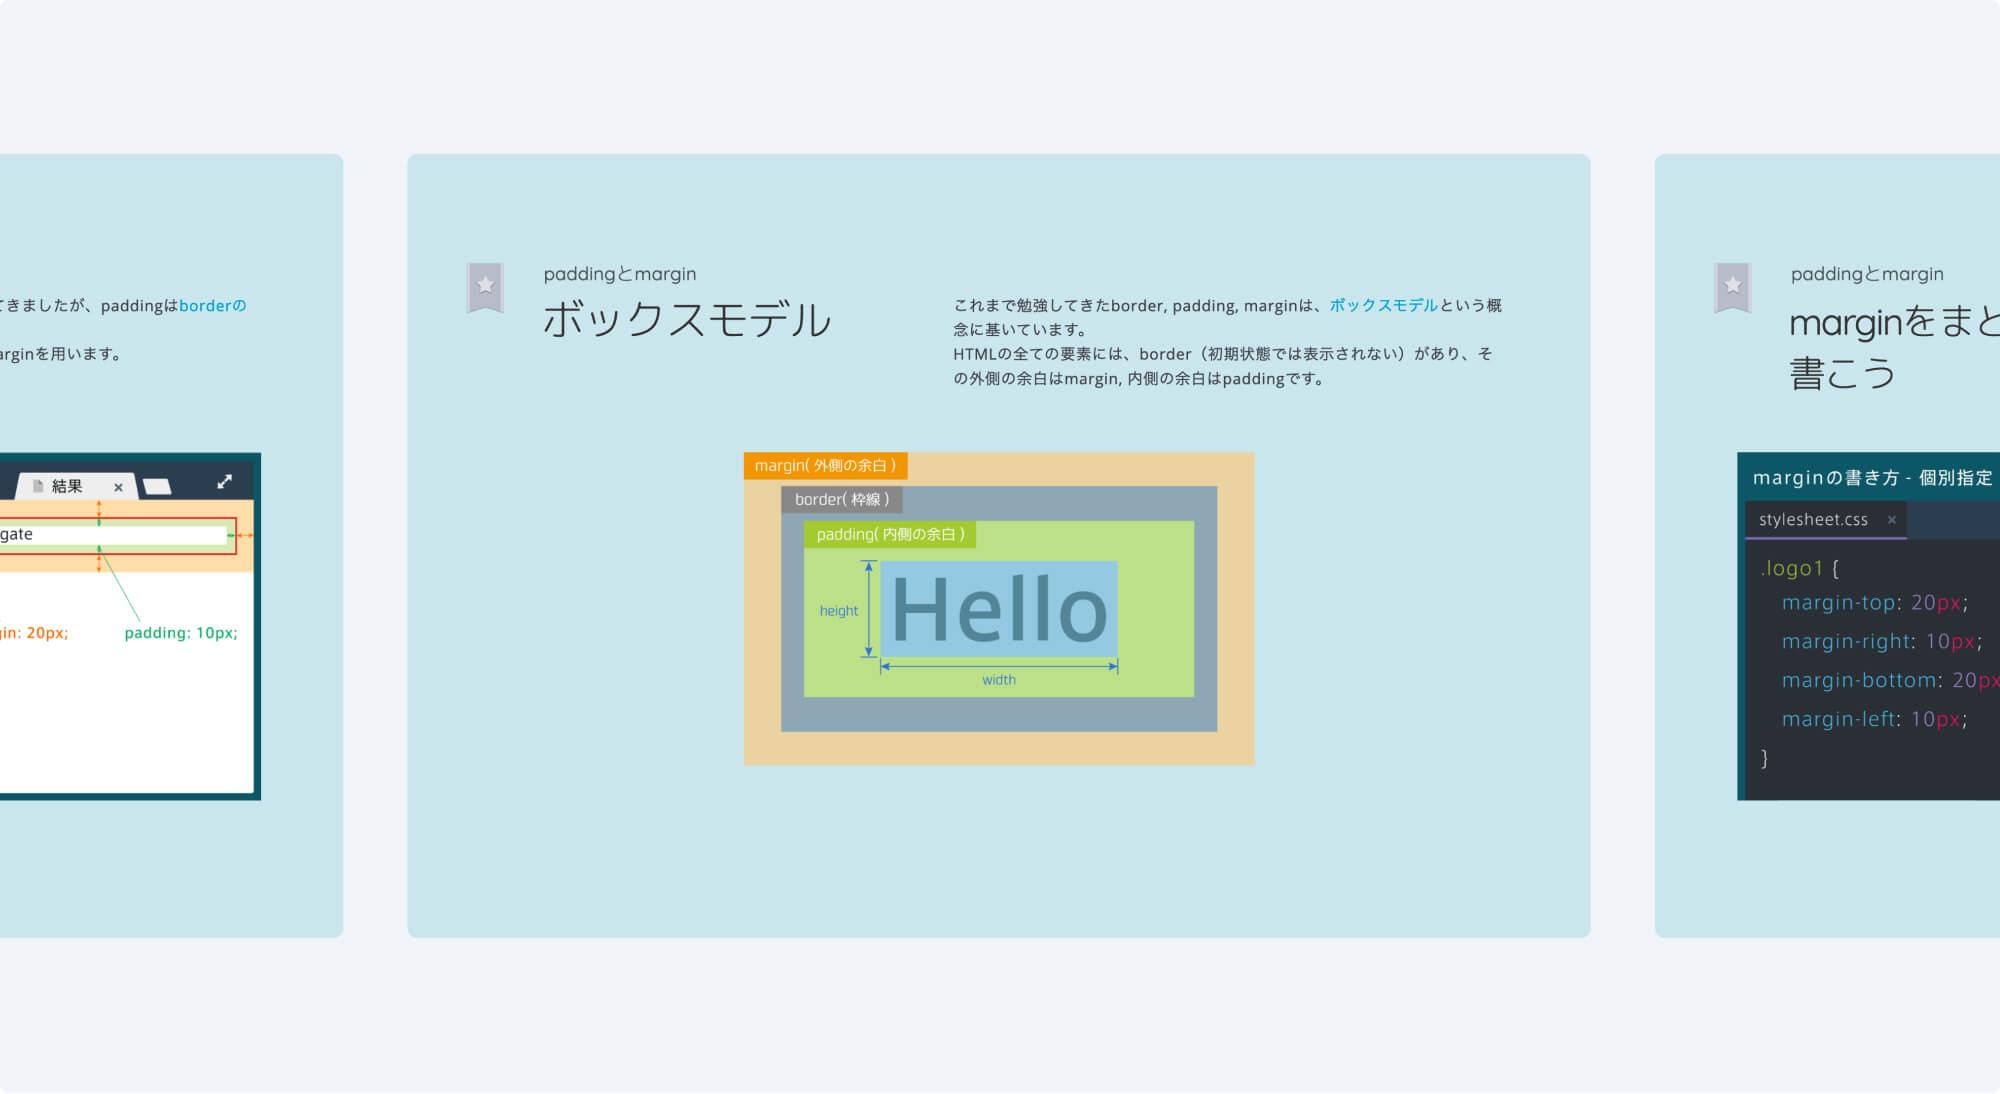 https://d2aj9sy12tbpym.cloudfront.net/javascripts/dist/assets/slide_image_jp-fe8d53e1a8a892cd55002e6eed6c757e.jpg